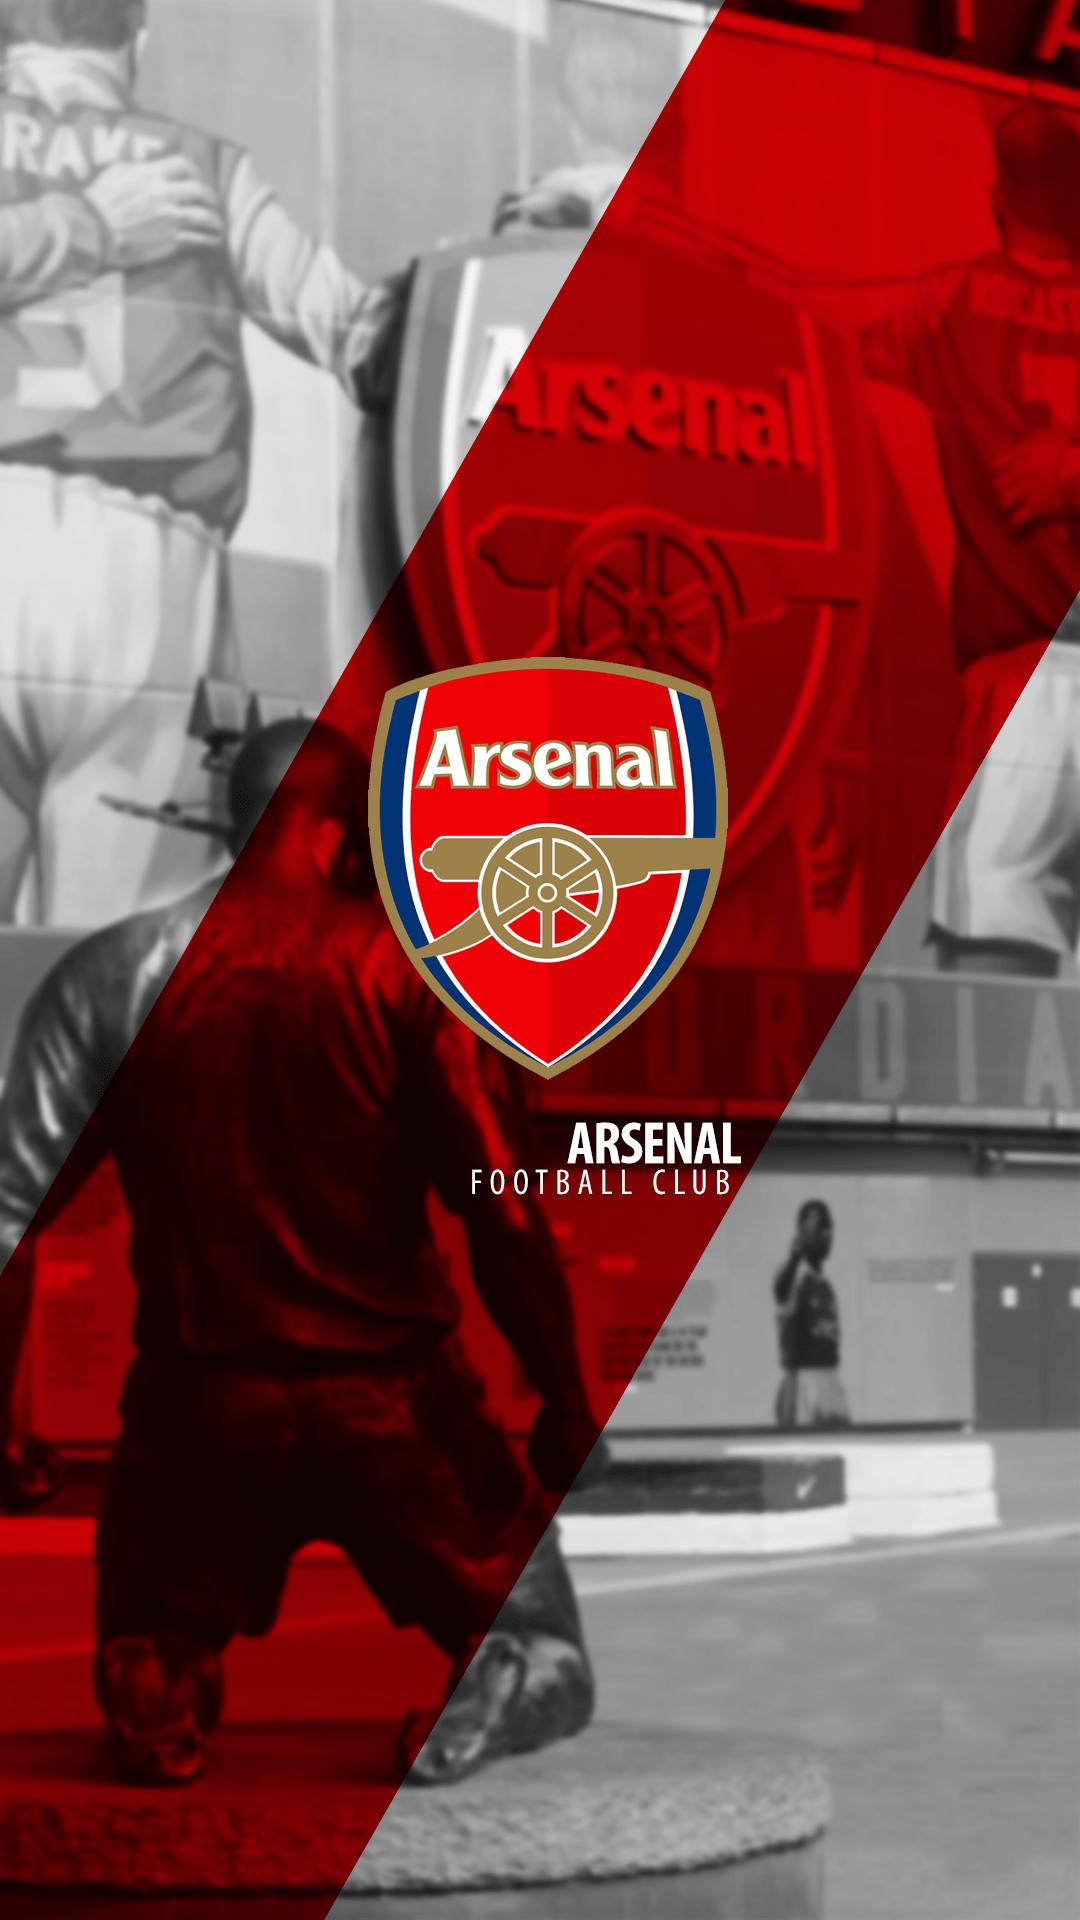 arsenal football club wallpapers top